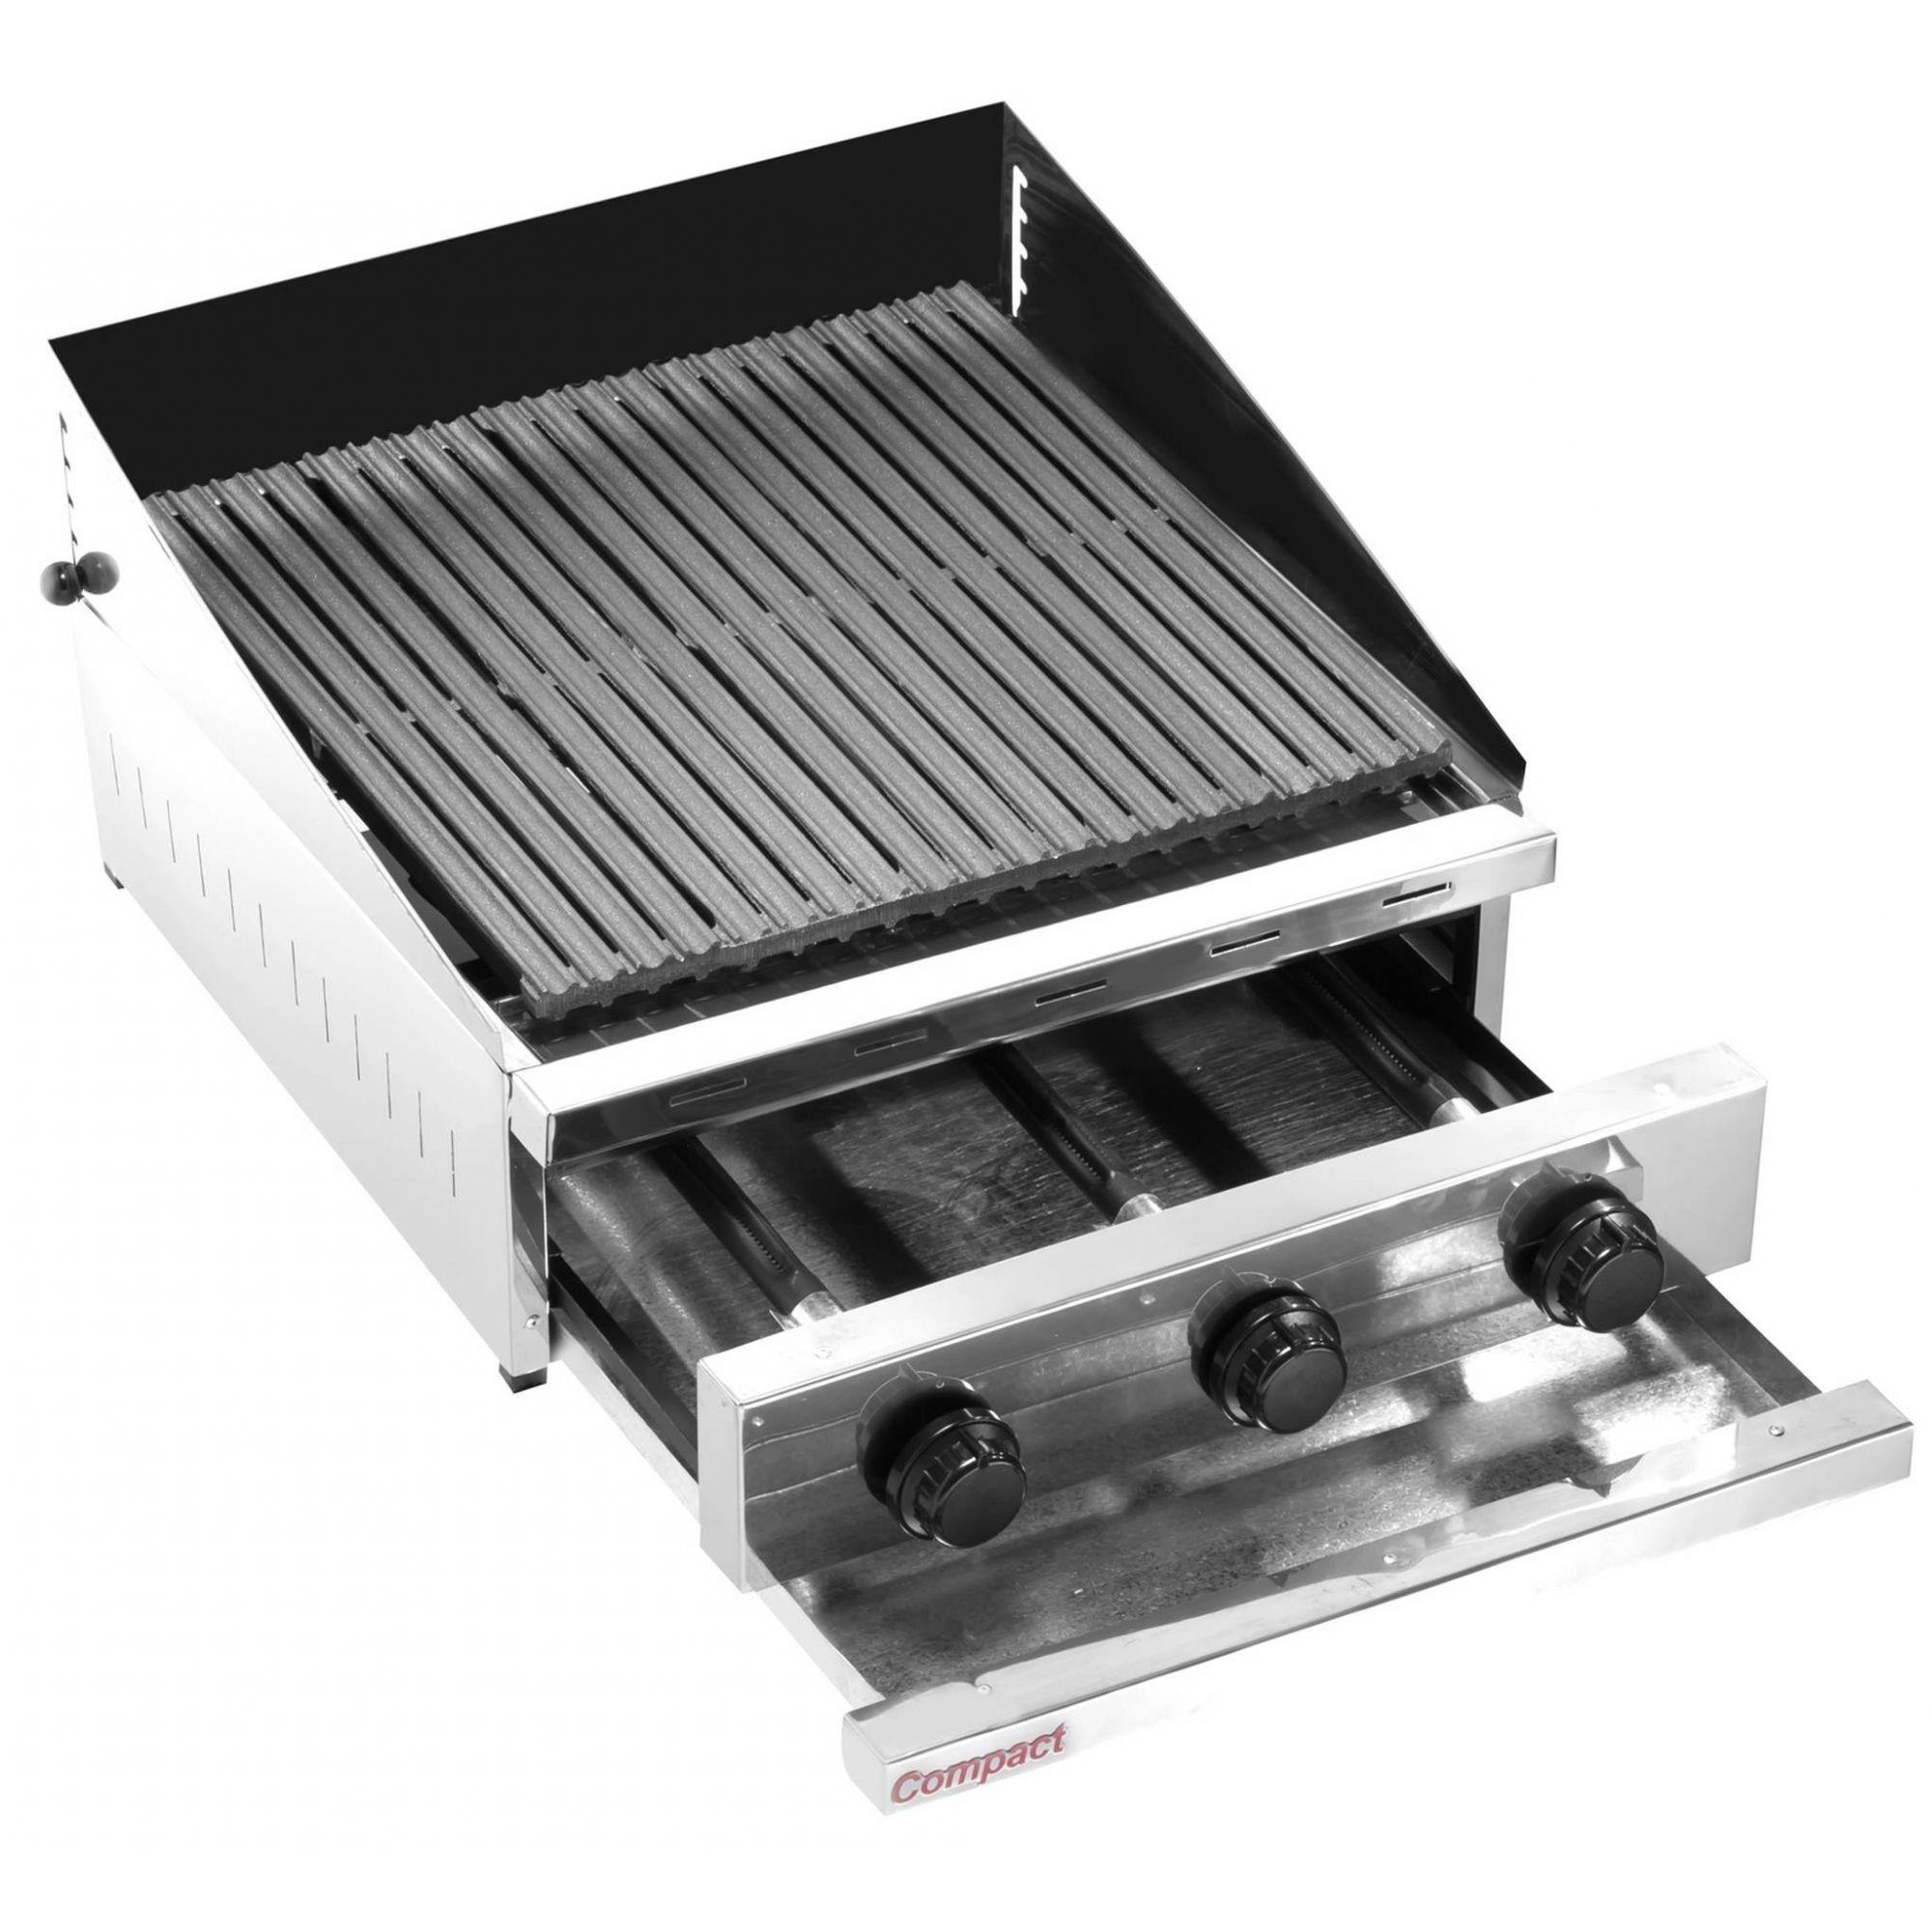 Char Broiler Picanheira a Gás 63X63 Compact - CH600F  - Carmel Equipamentos